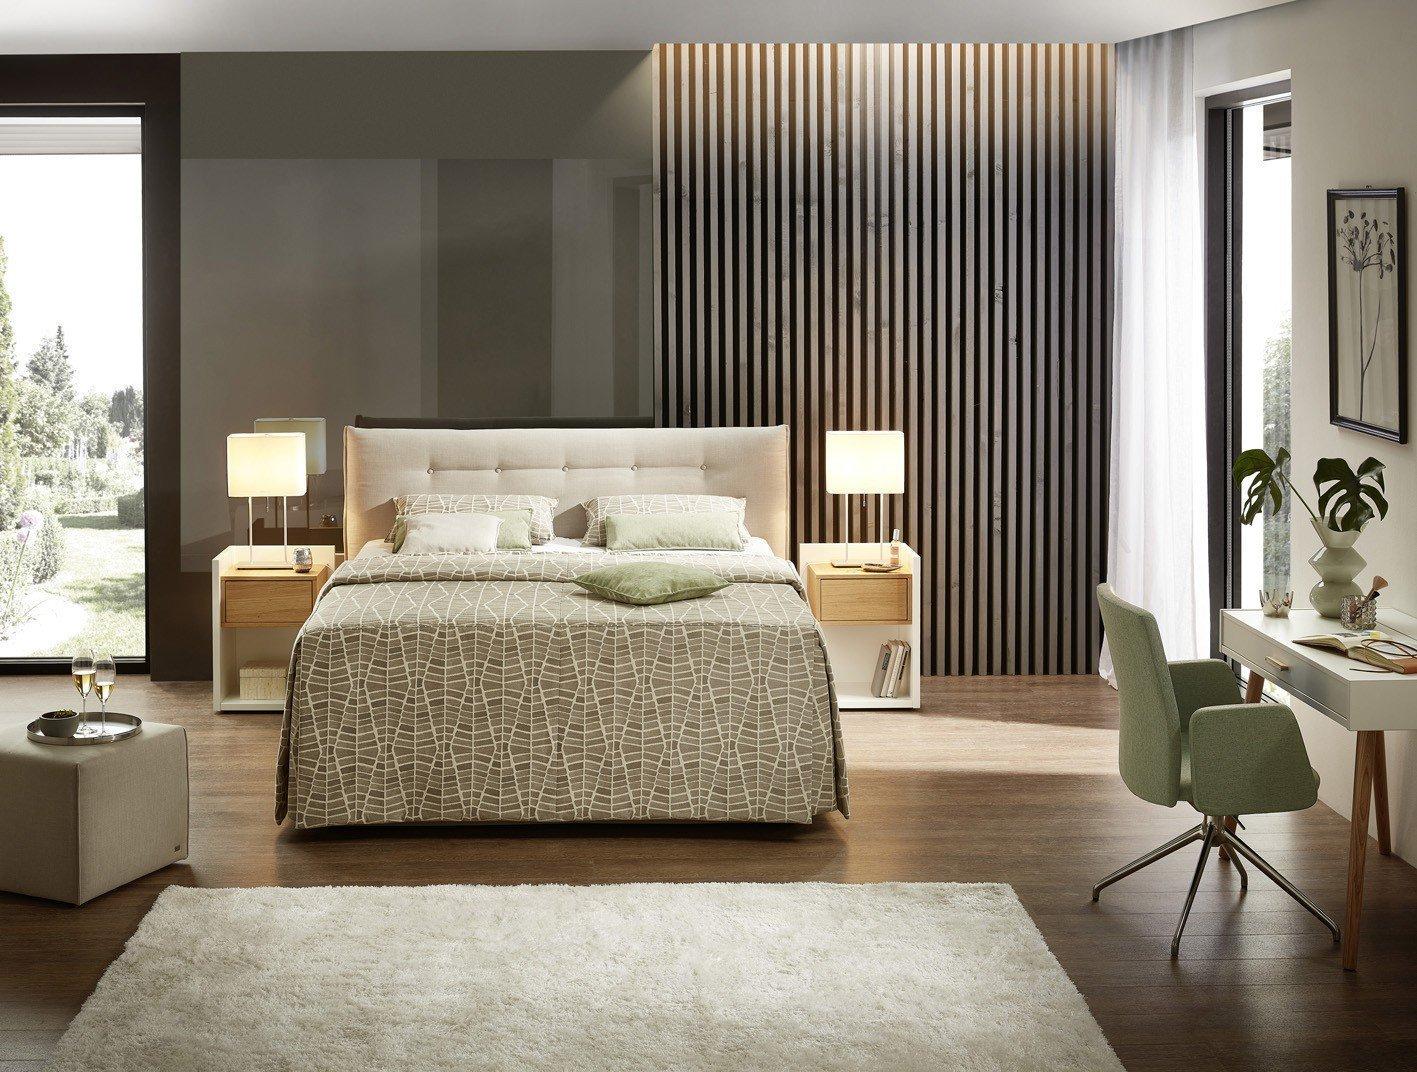 ruf veneto polsterbett in natur inklusive bettkasten m bel letz ihr online shop. Black Bedroom Furniture Sets. Home Design Ideas